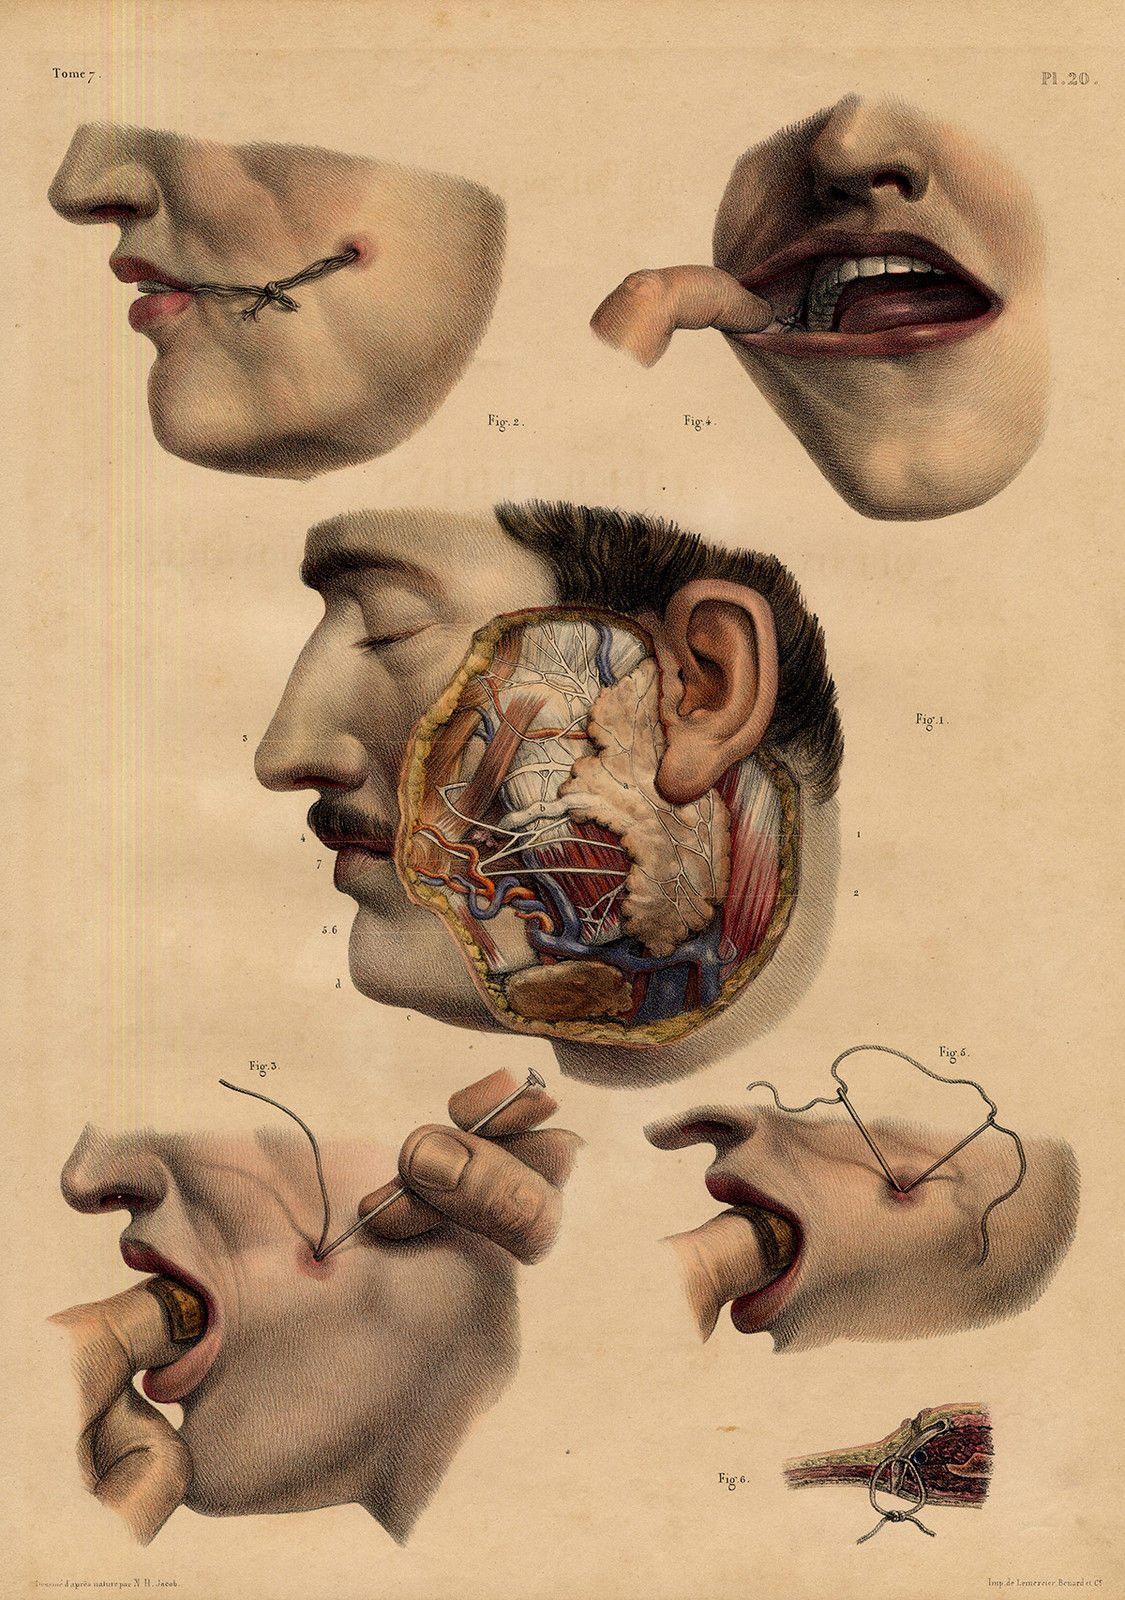 Pin de MediaMed en Vintage Surgery   Pinterest   Anatomía, Anatomía ...